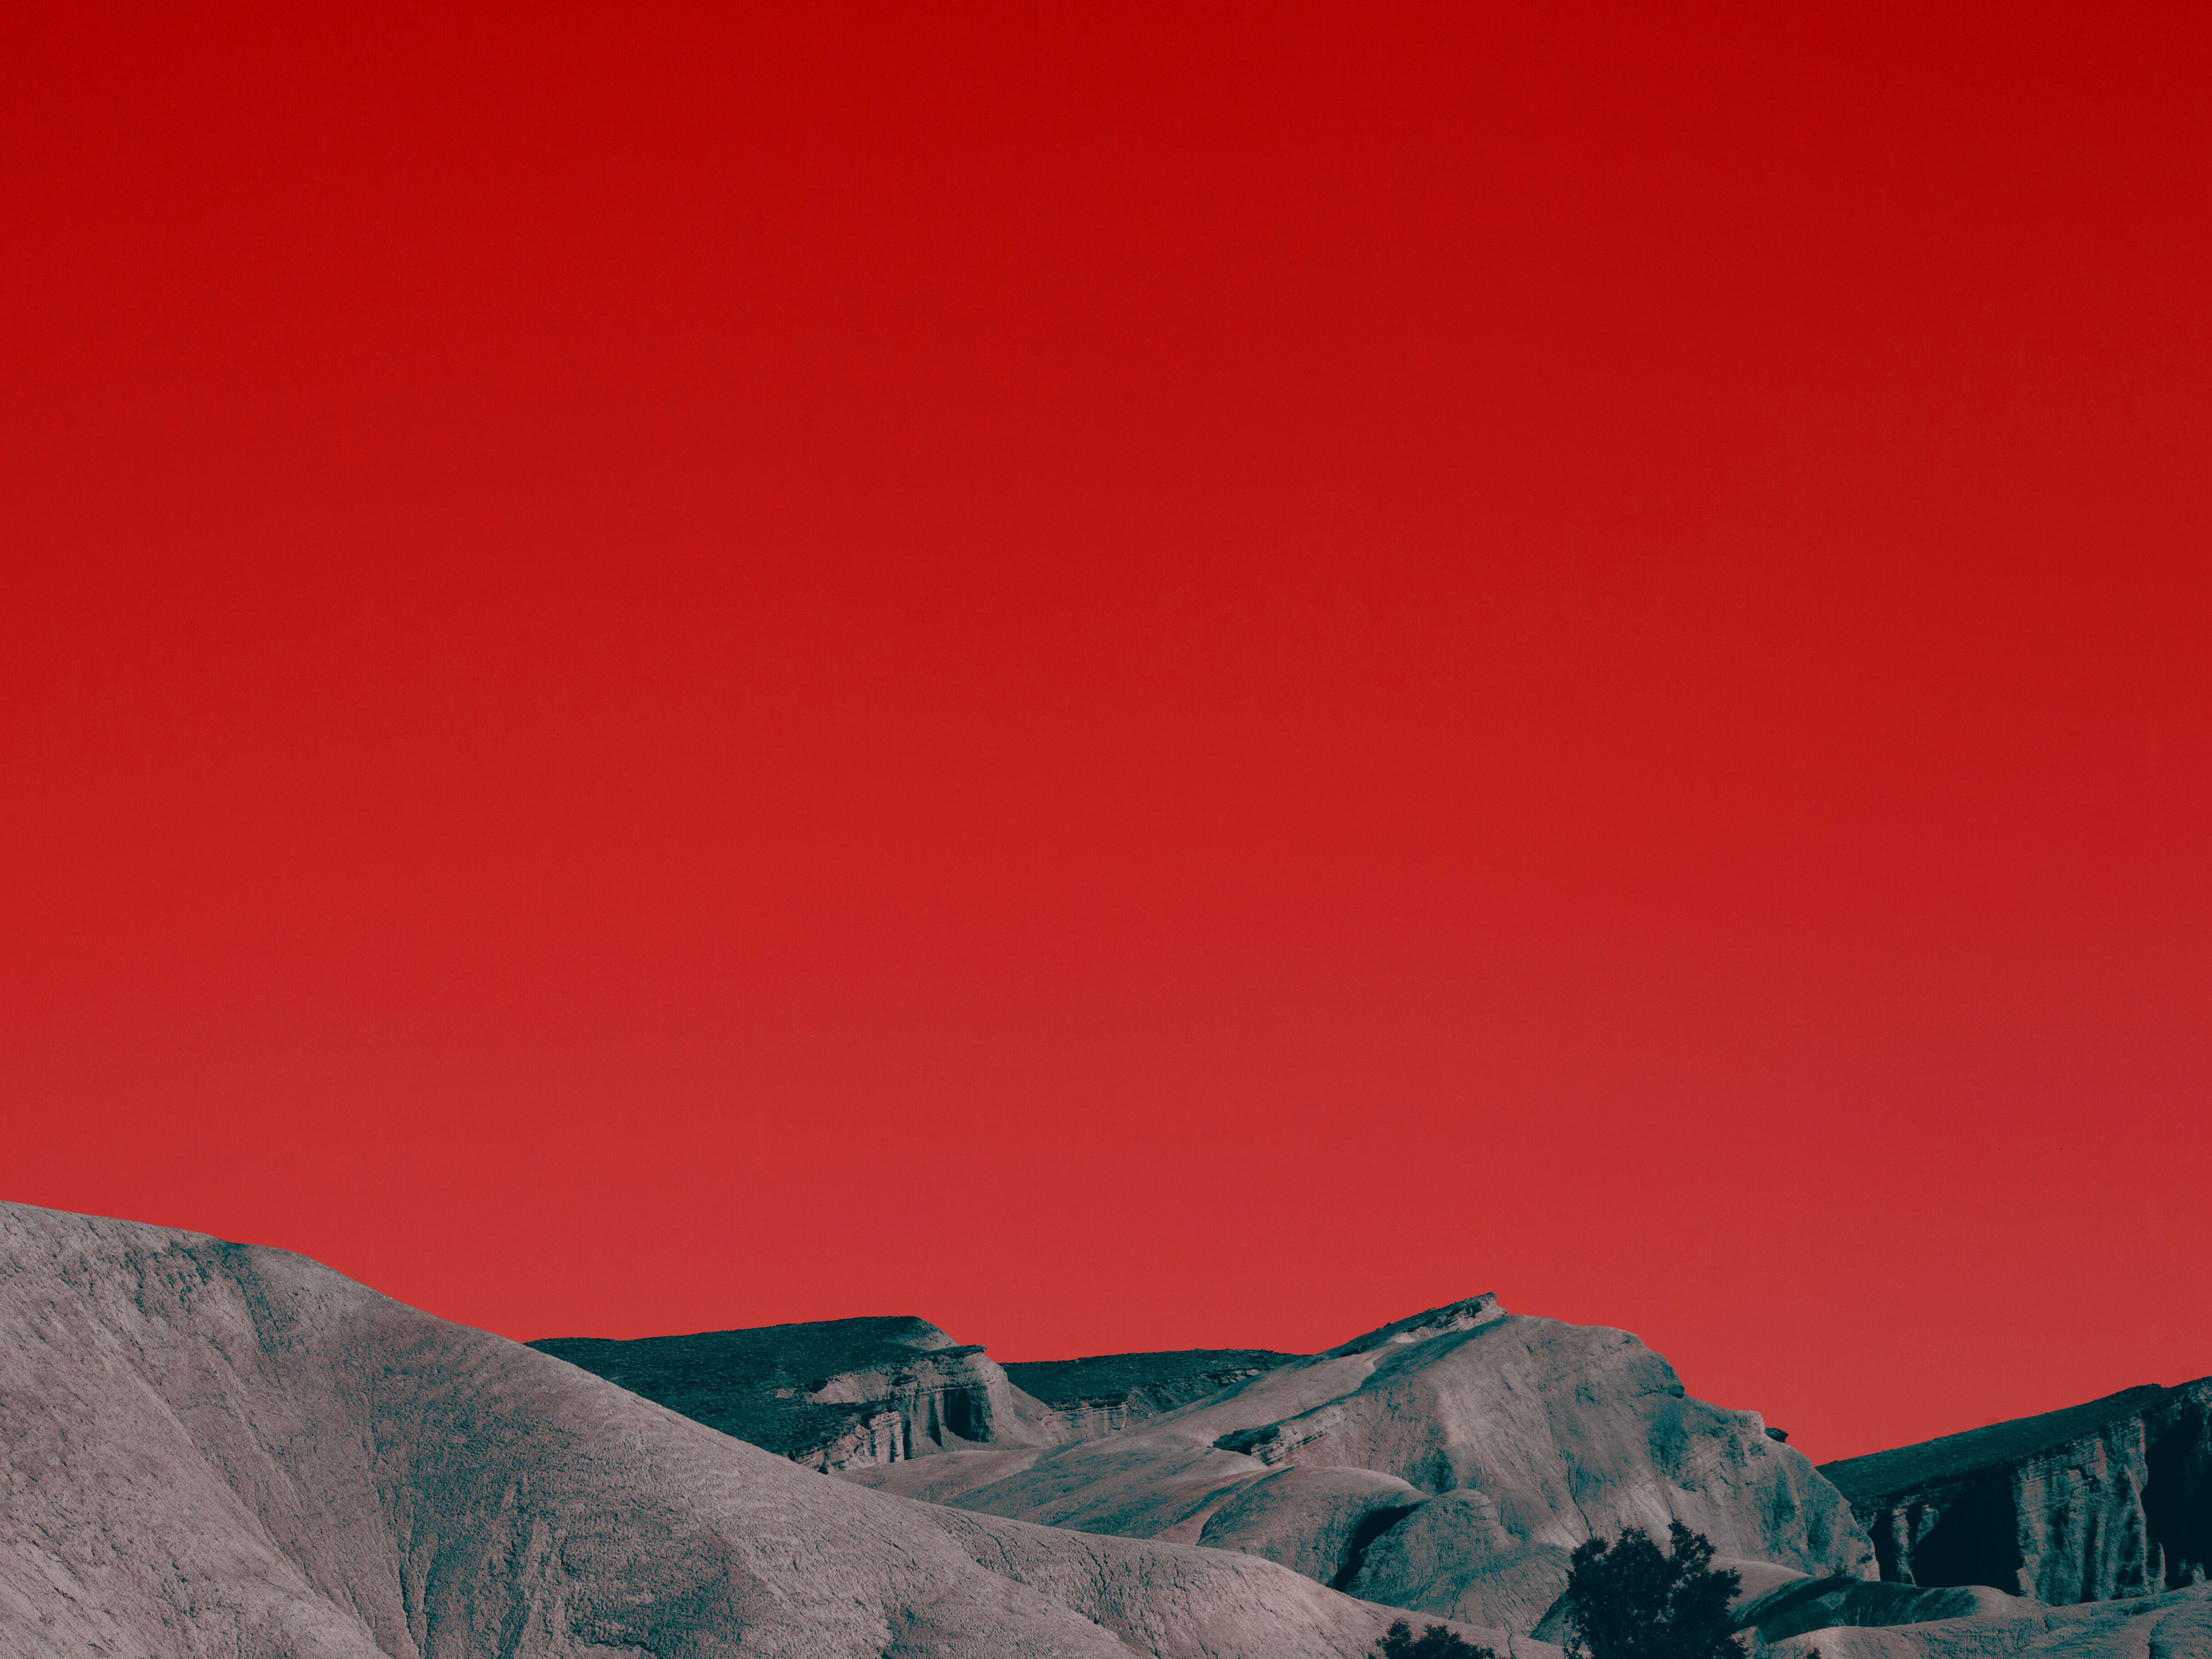 AldoChacon_red_009_16x12.jpg